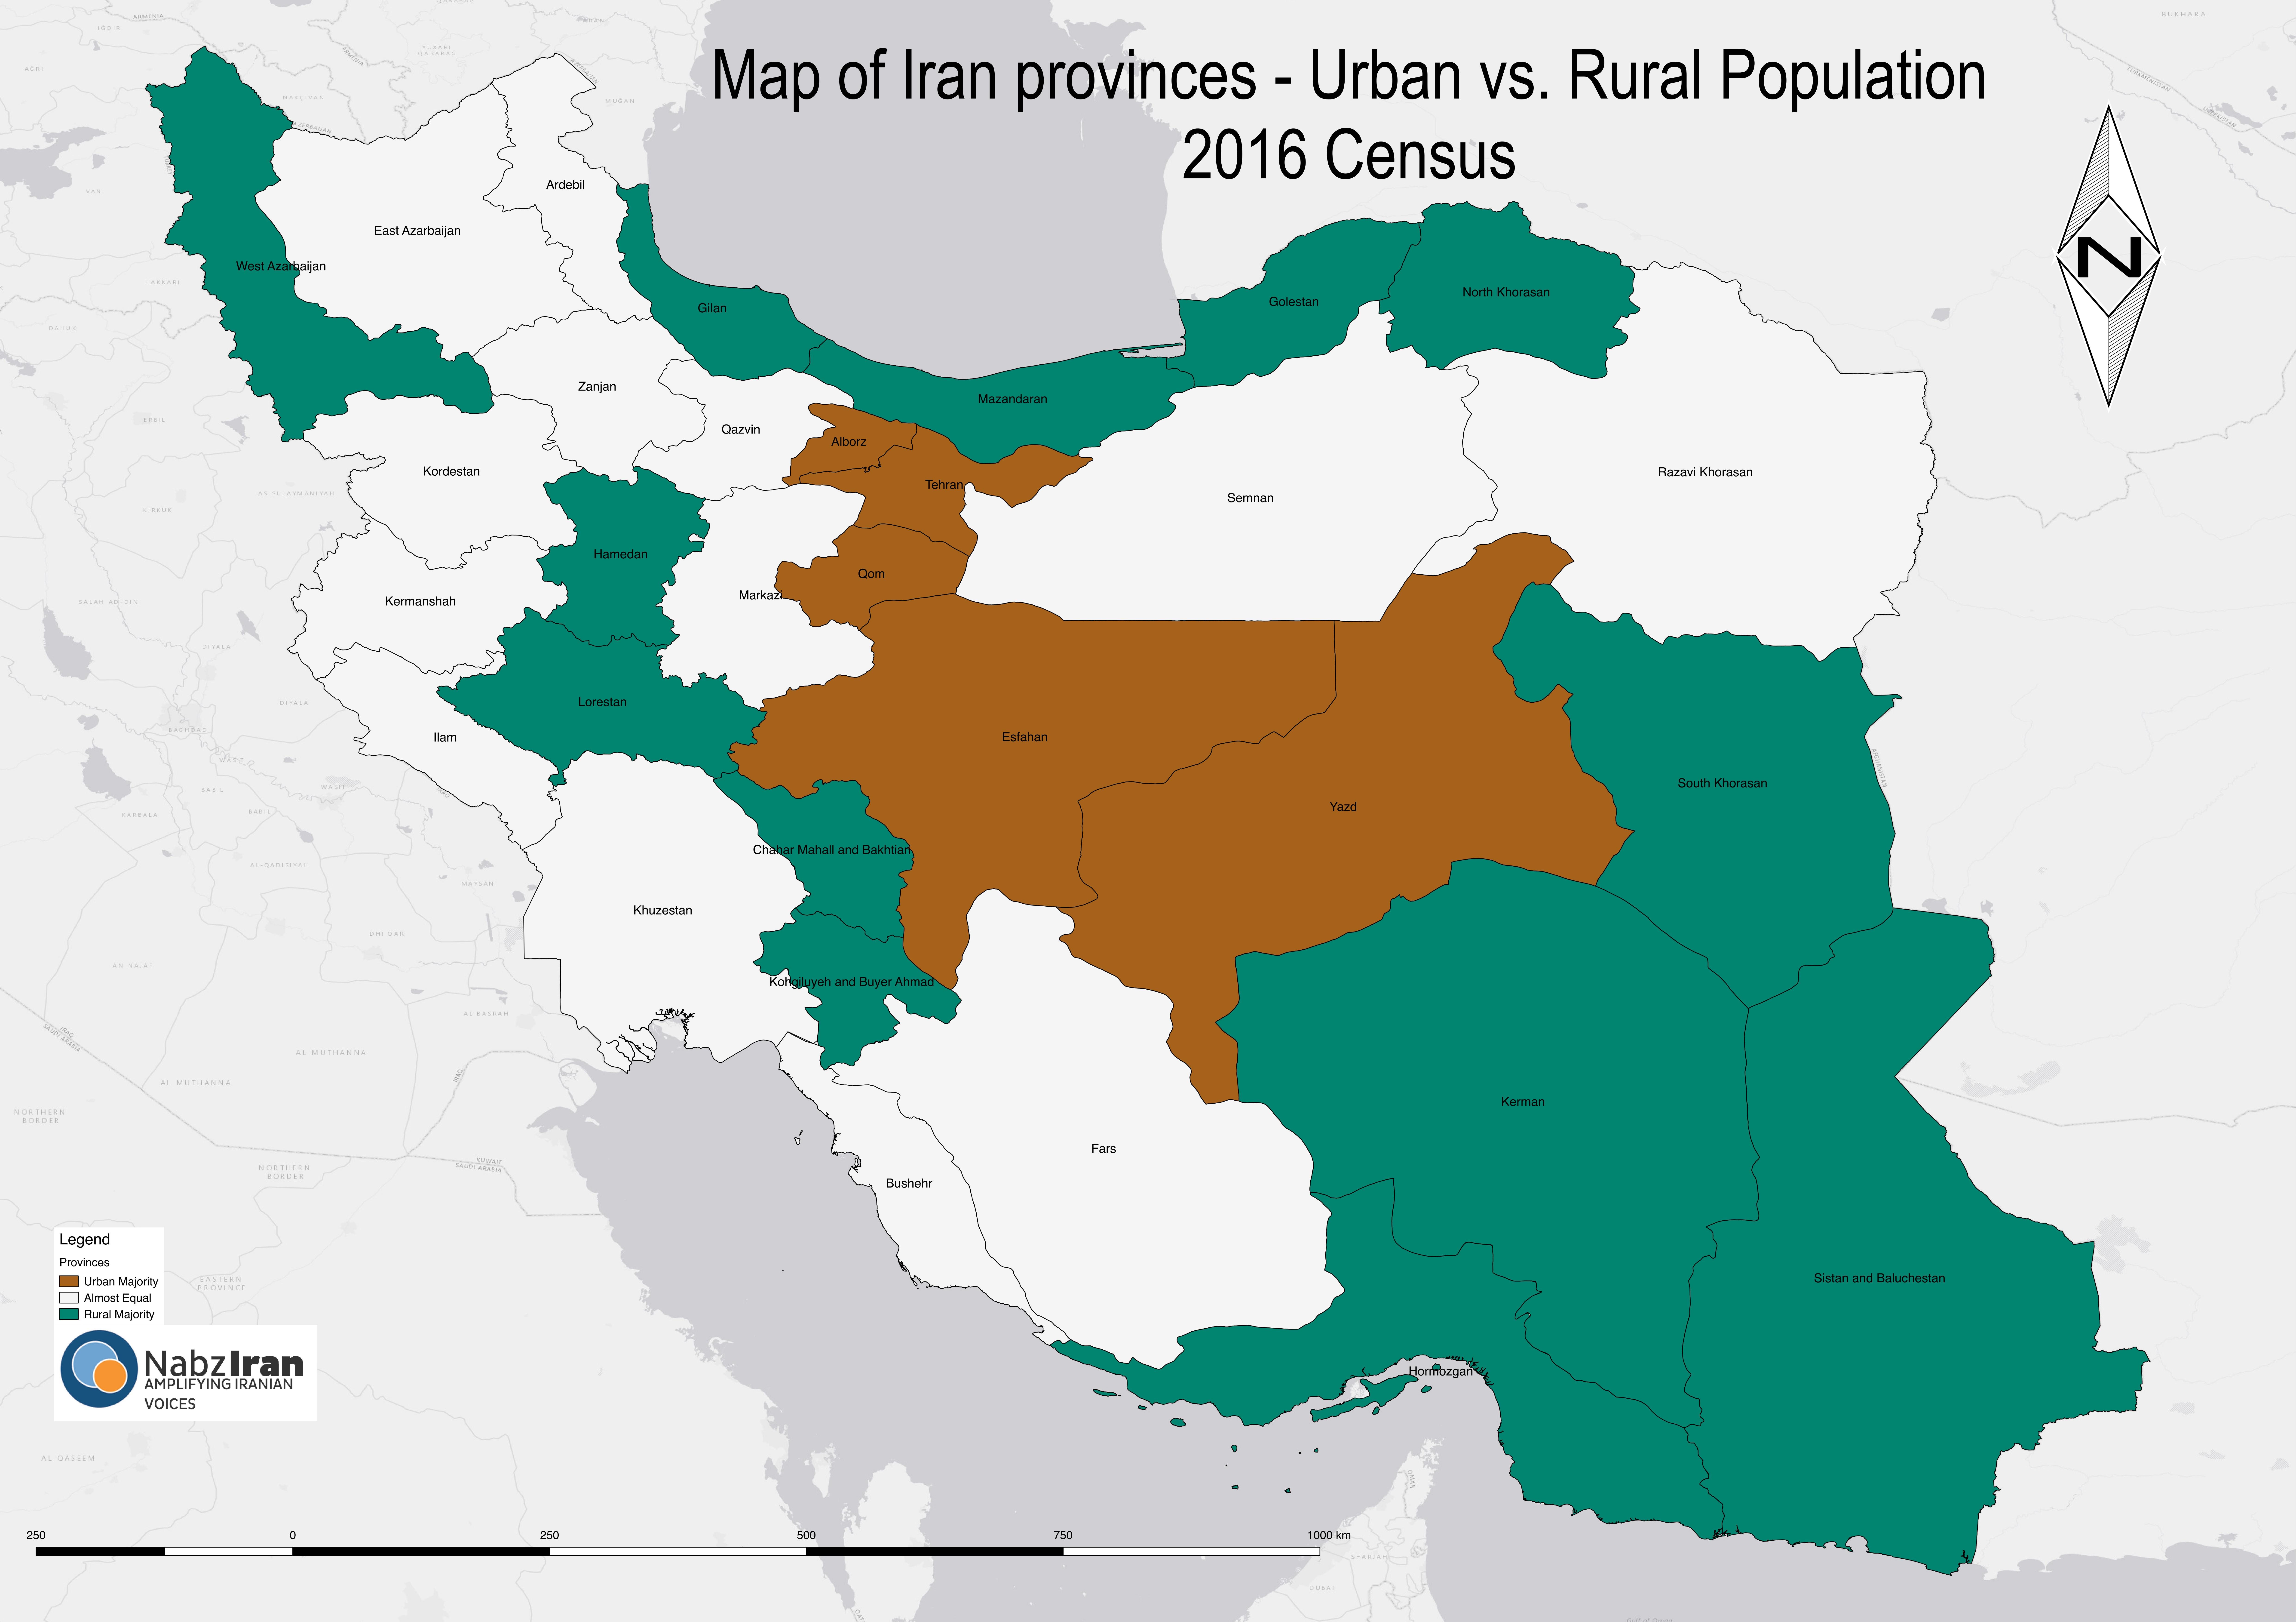 Iran On Map Of World.Nabz Iran Map Of Iran Provinces Urban Vs Rural Population